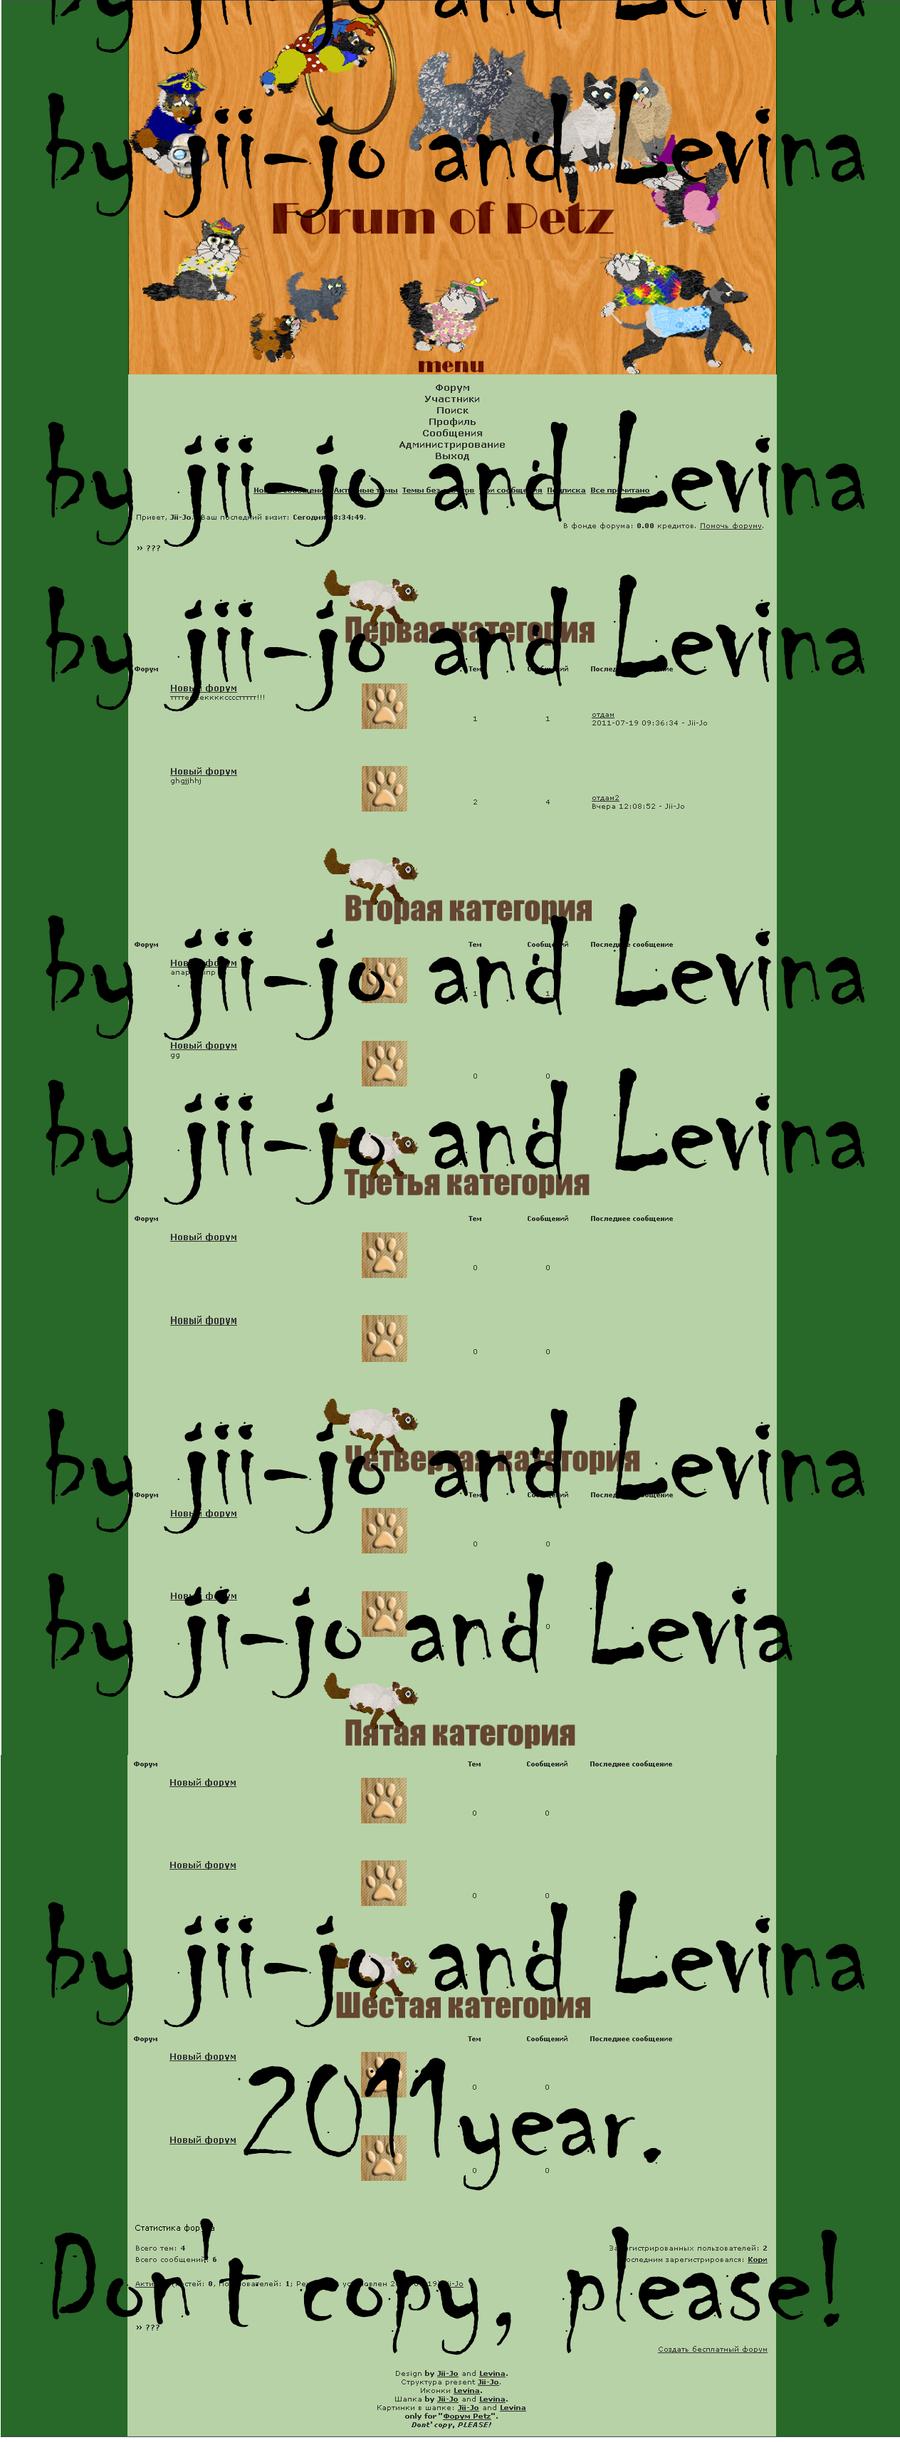 http://fc01.deviantart.net/fs70/i/2011/210/e/0/forum_of_petz5__v_1_by_jii_jo-d4213u7.png